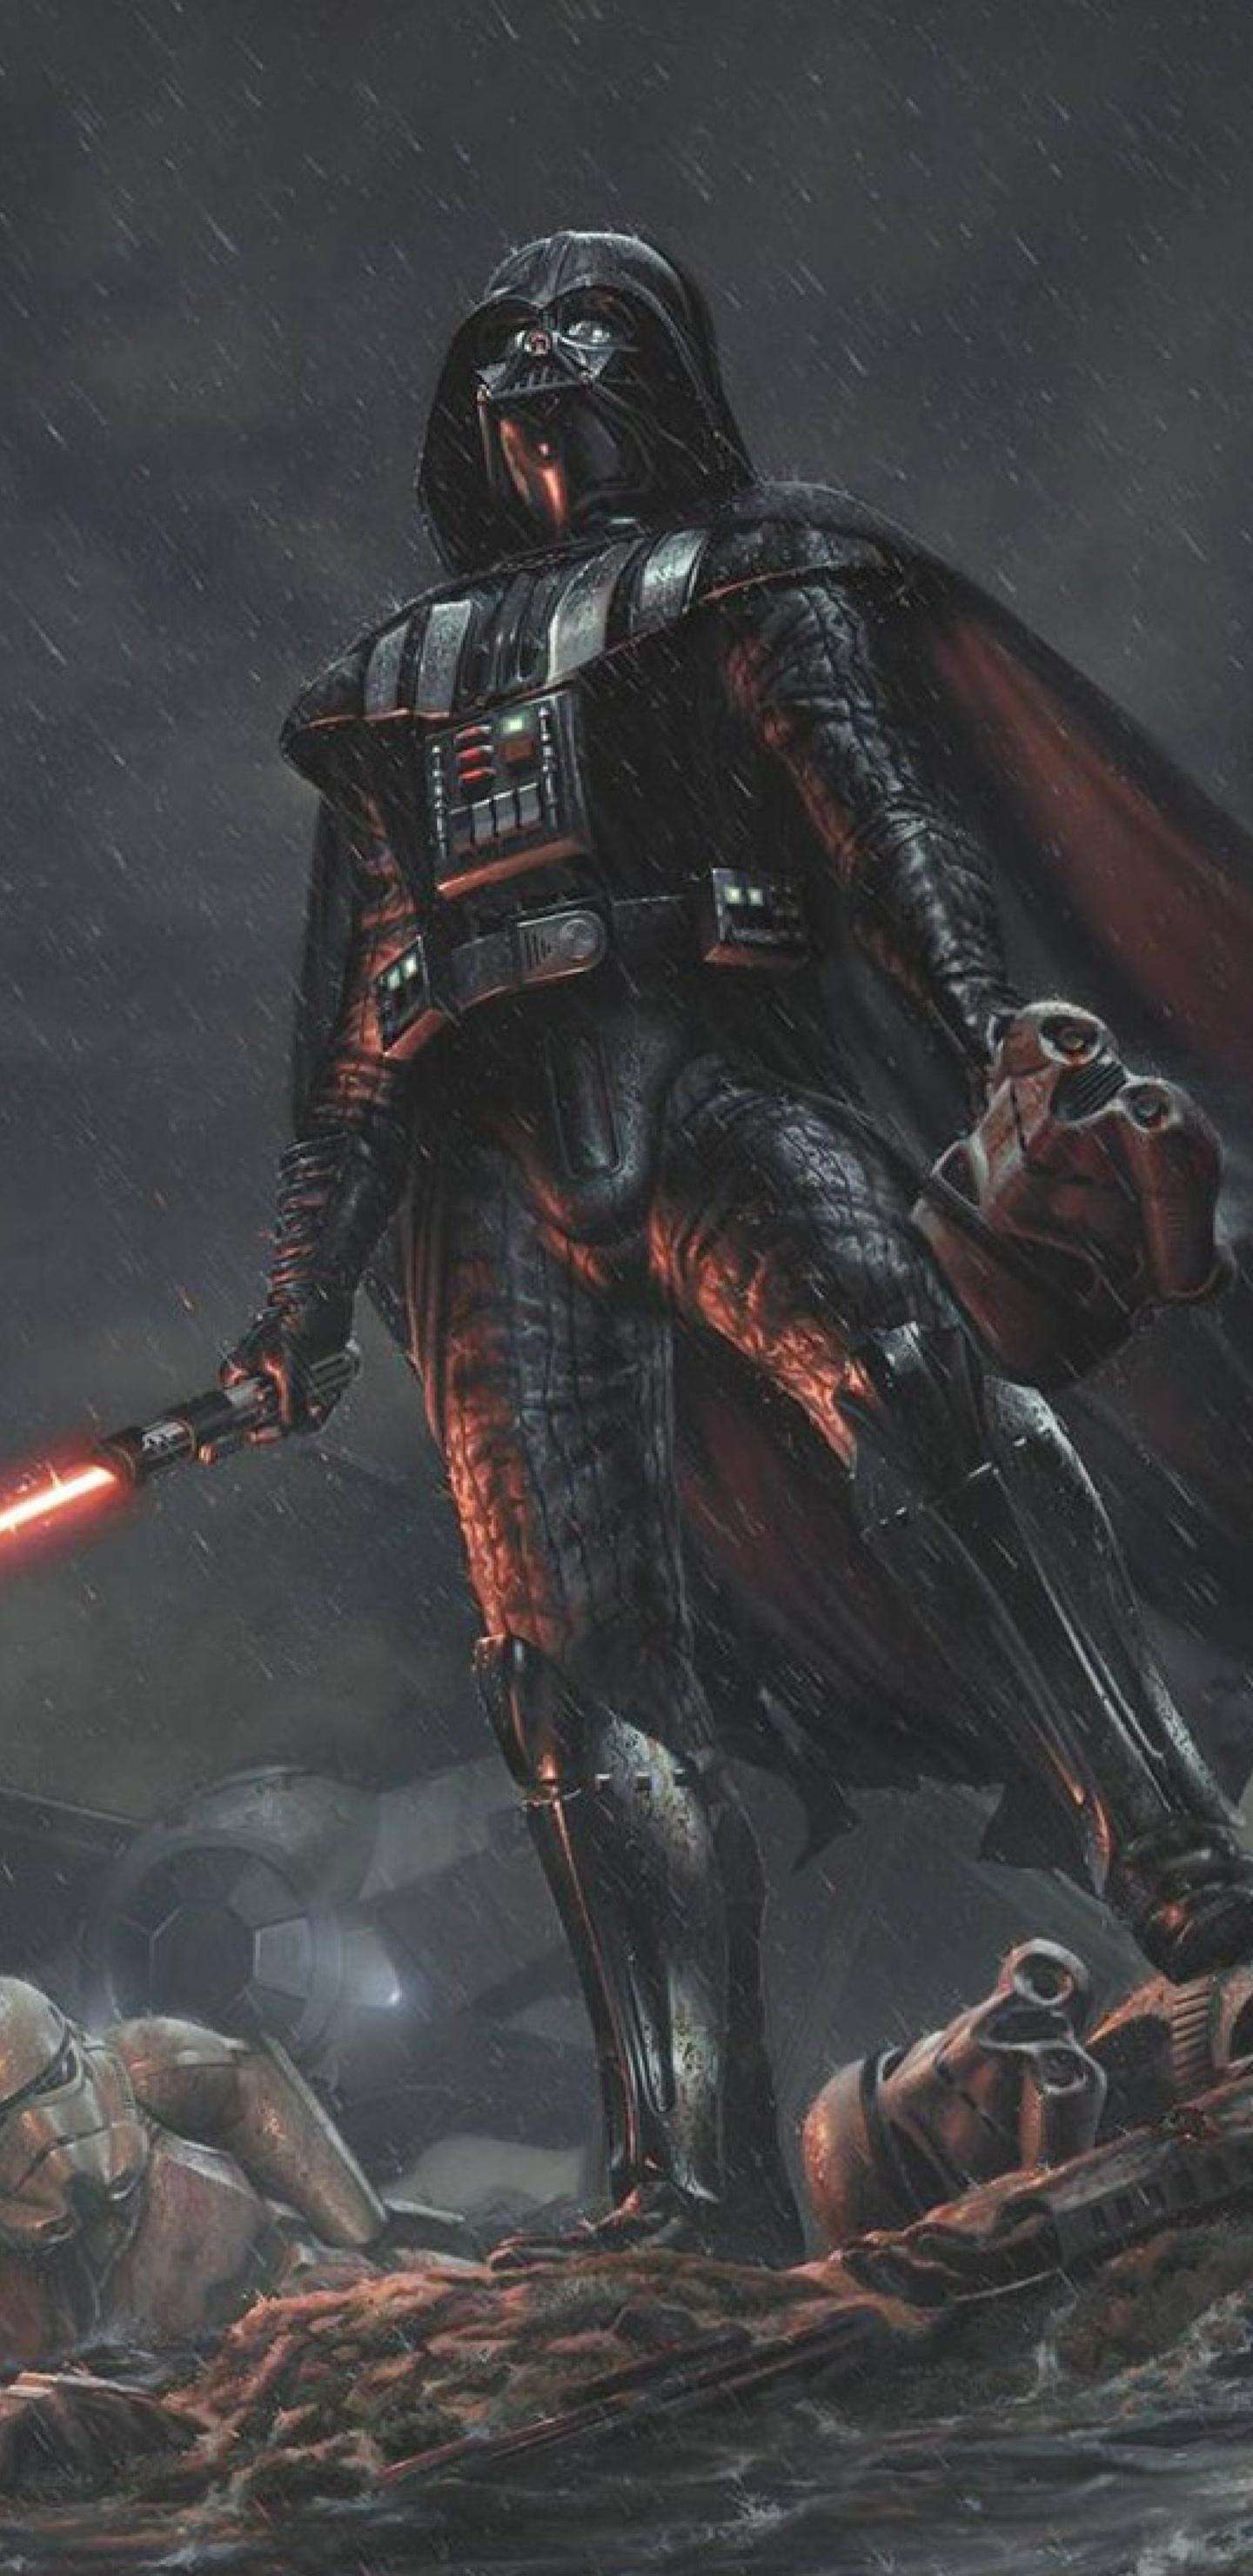 1440x2960 Darth Vader Star Wars 4k Samsung Galaxy Note 9,8 ...